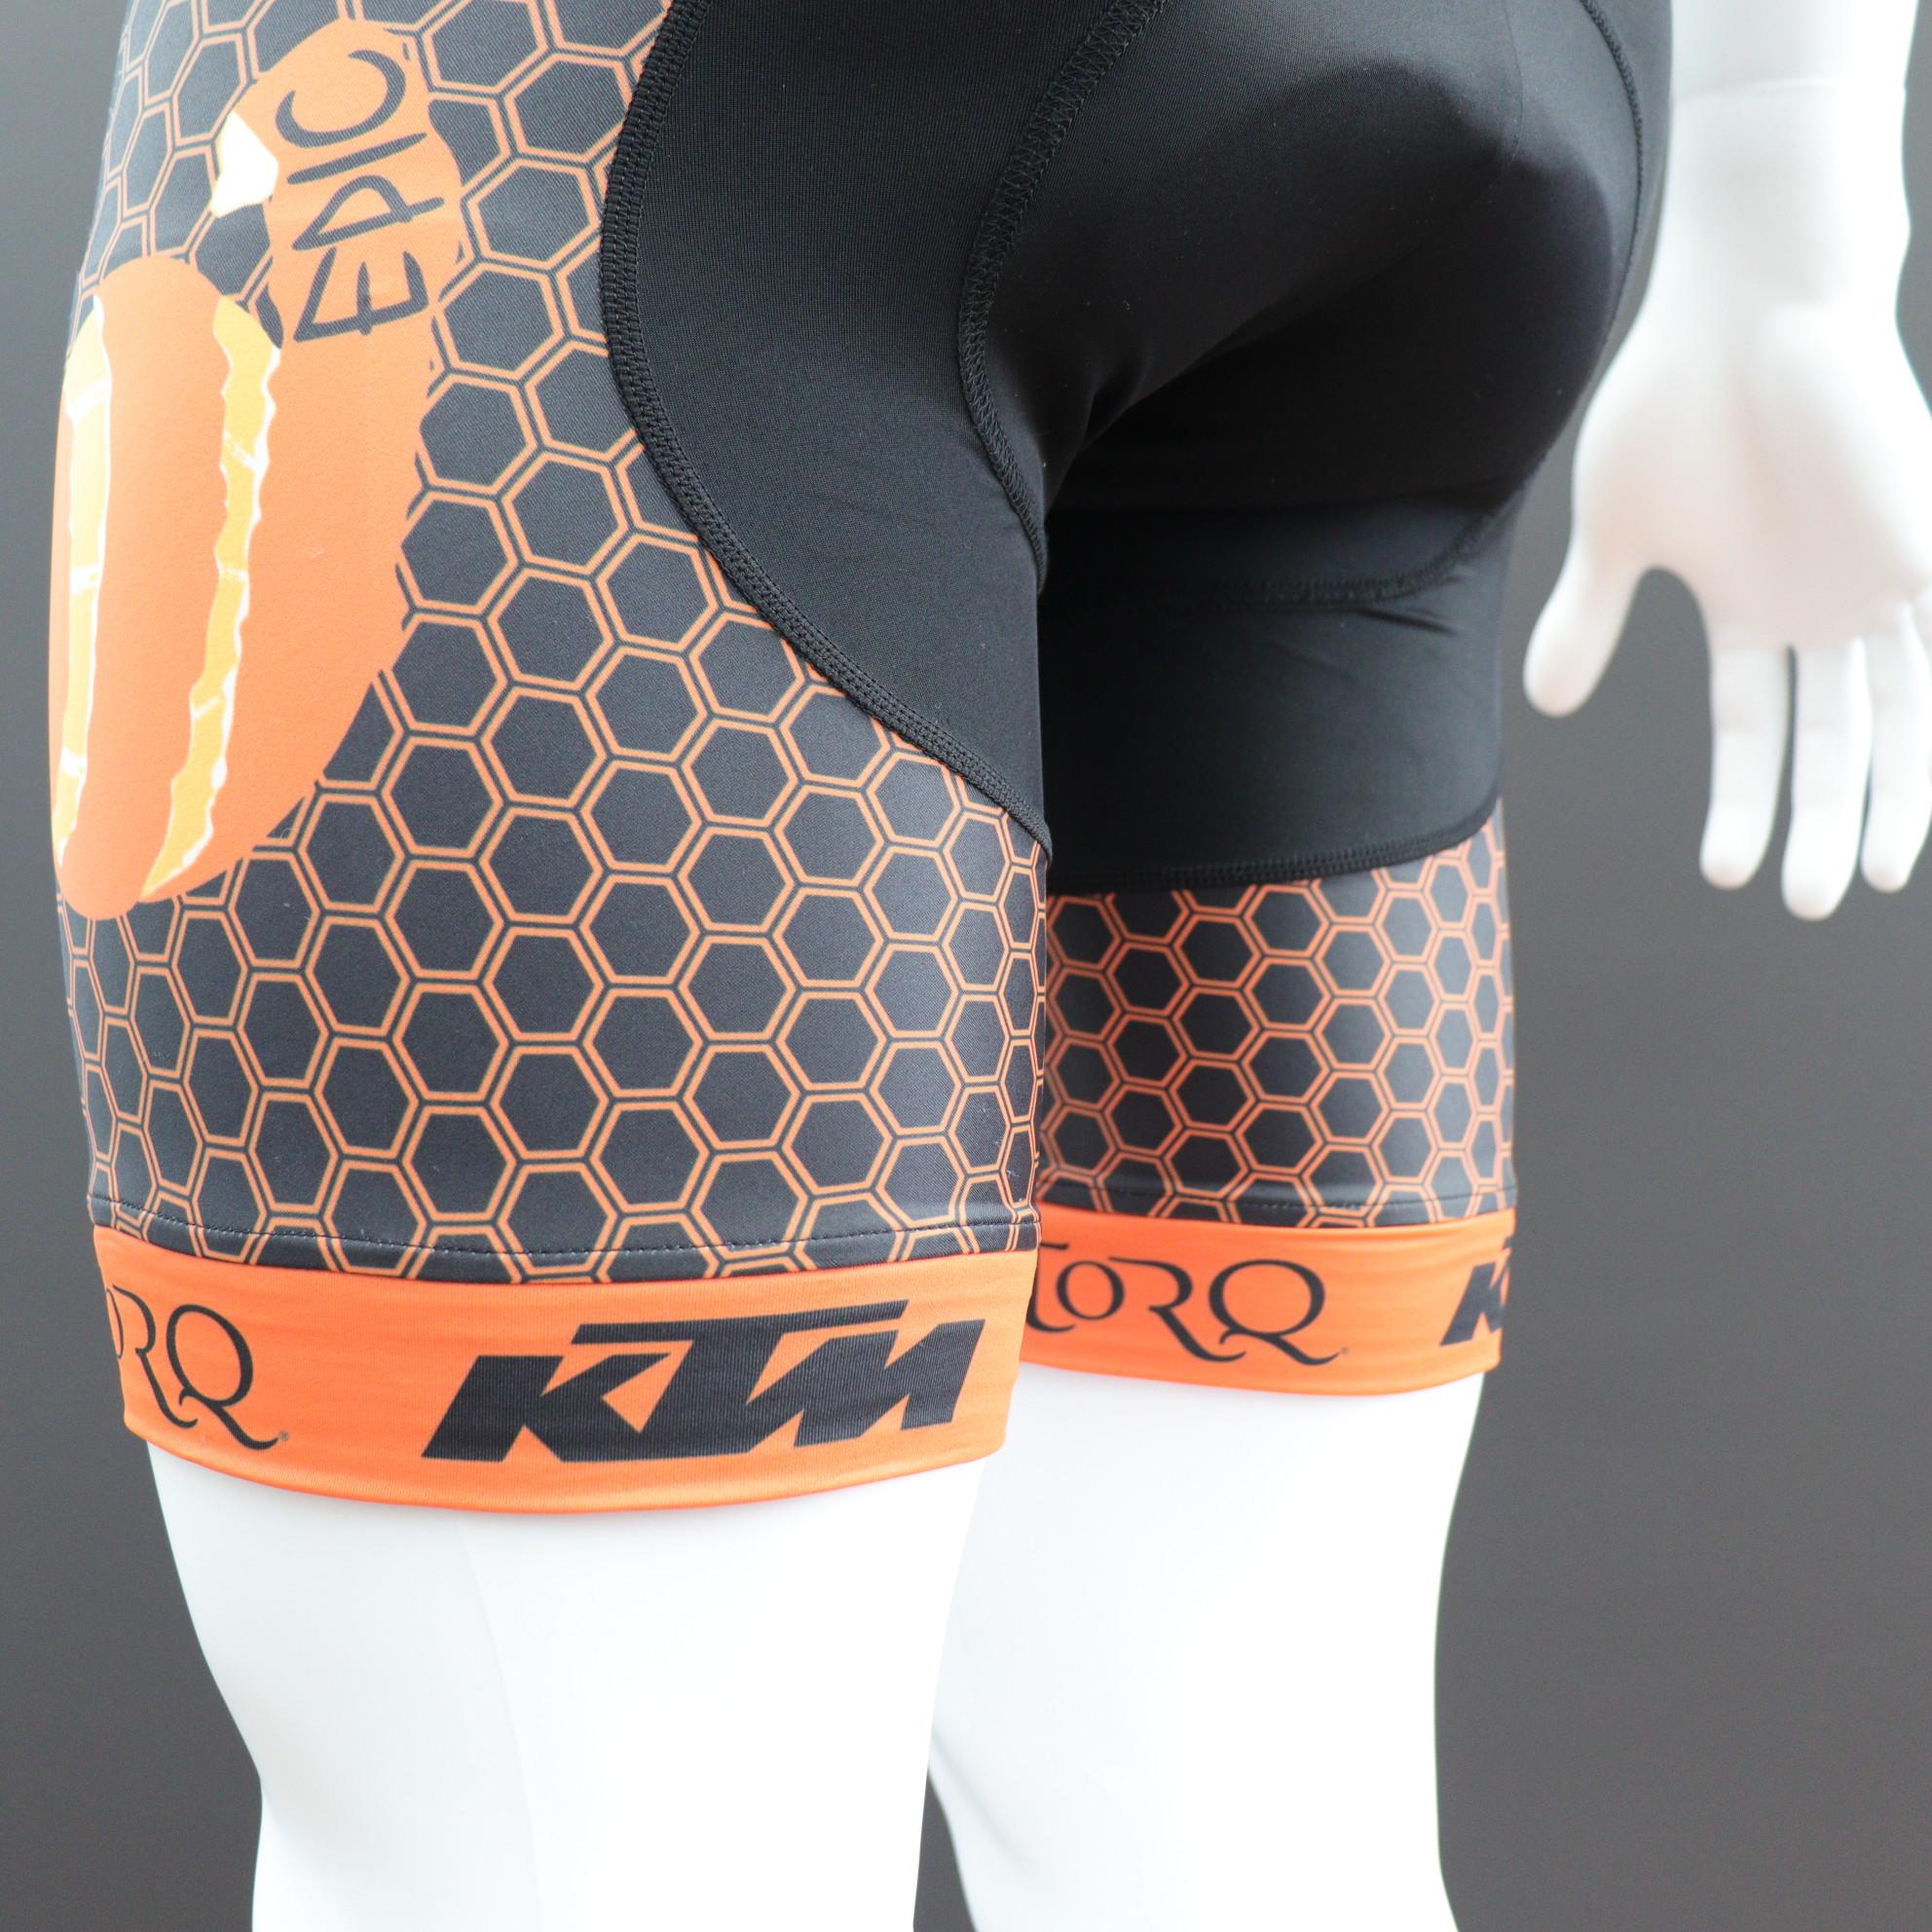 Classic Cycle Bib Shorts - Classic Leg Length